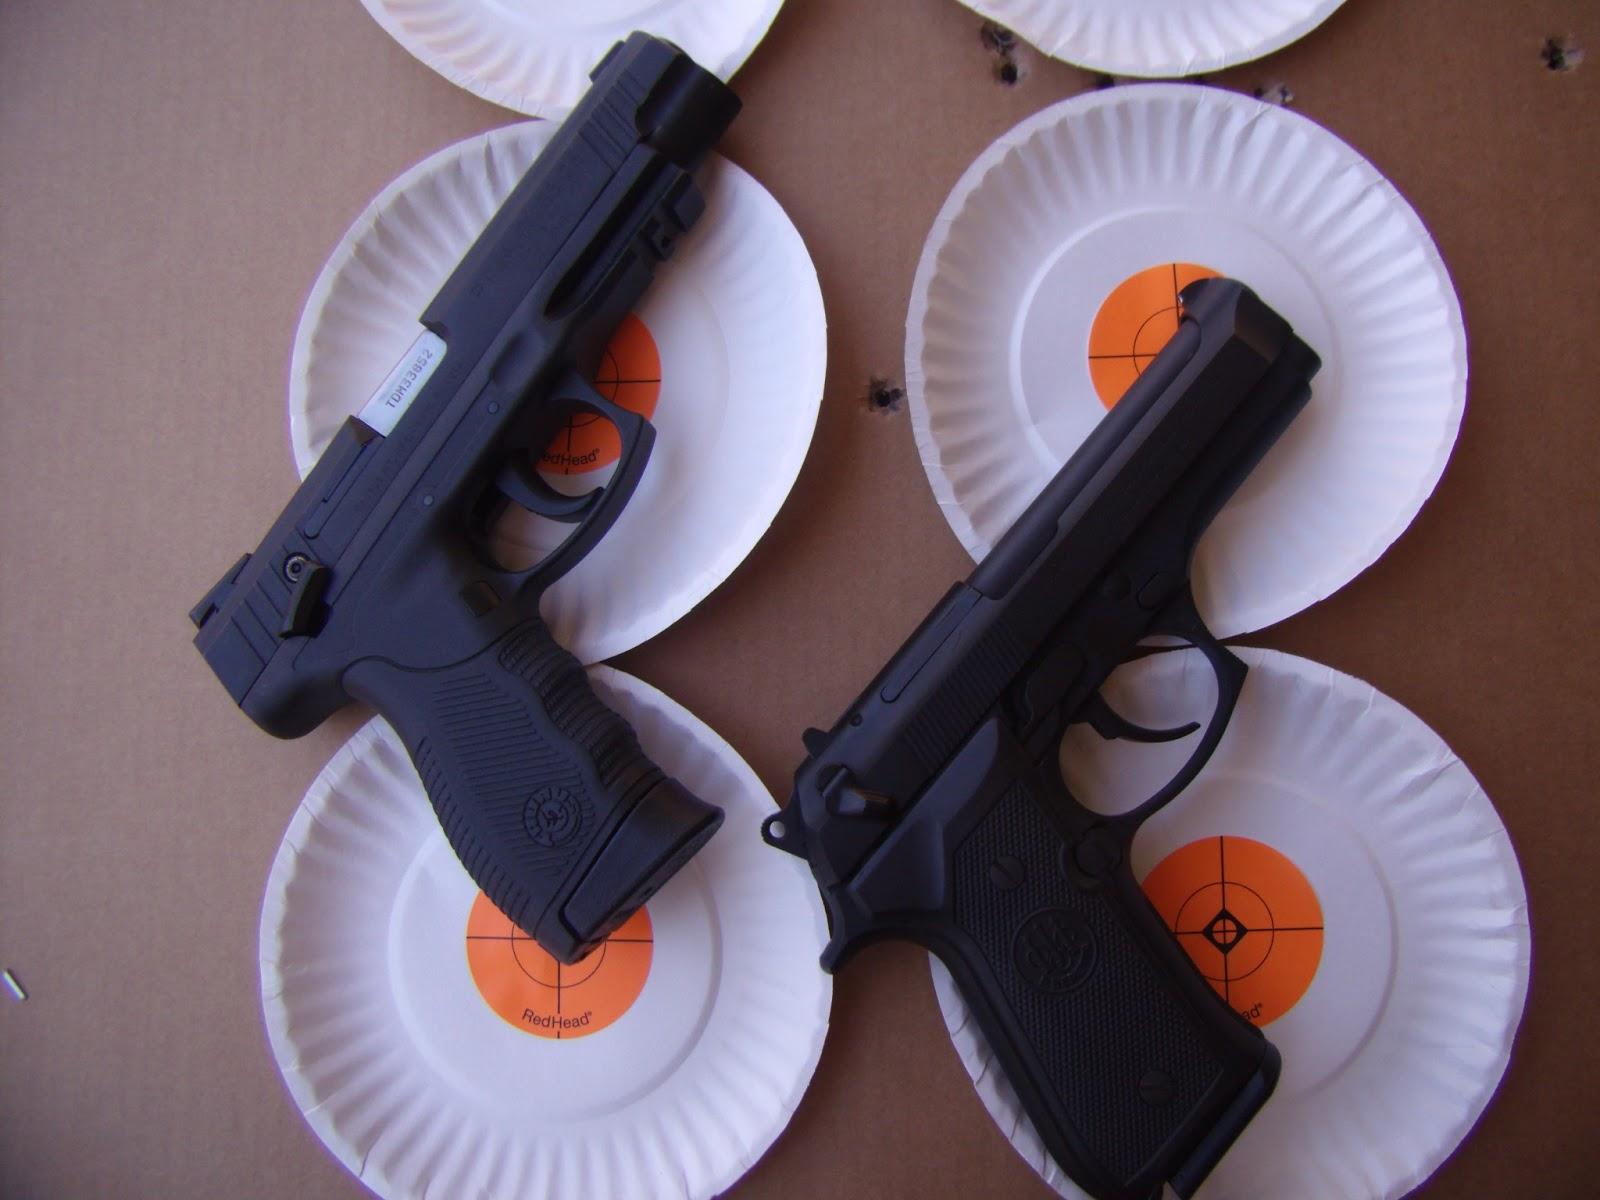 The Daywalker's Dad: Beretta 92FS vs Taurus 24/7 OSS